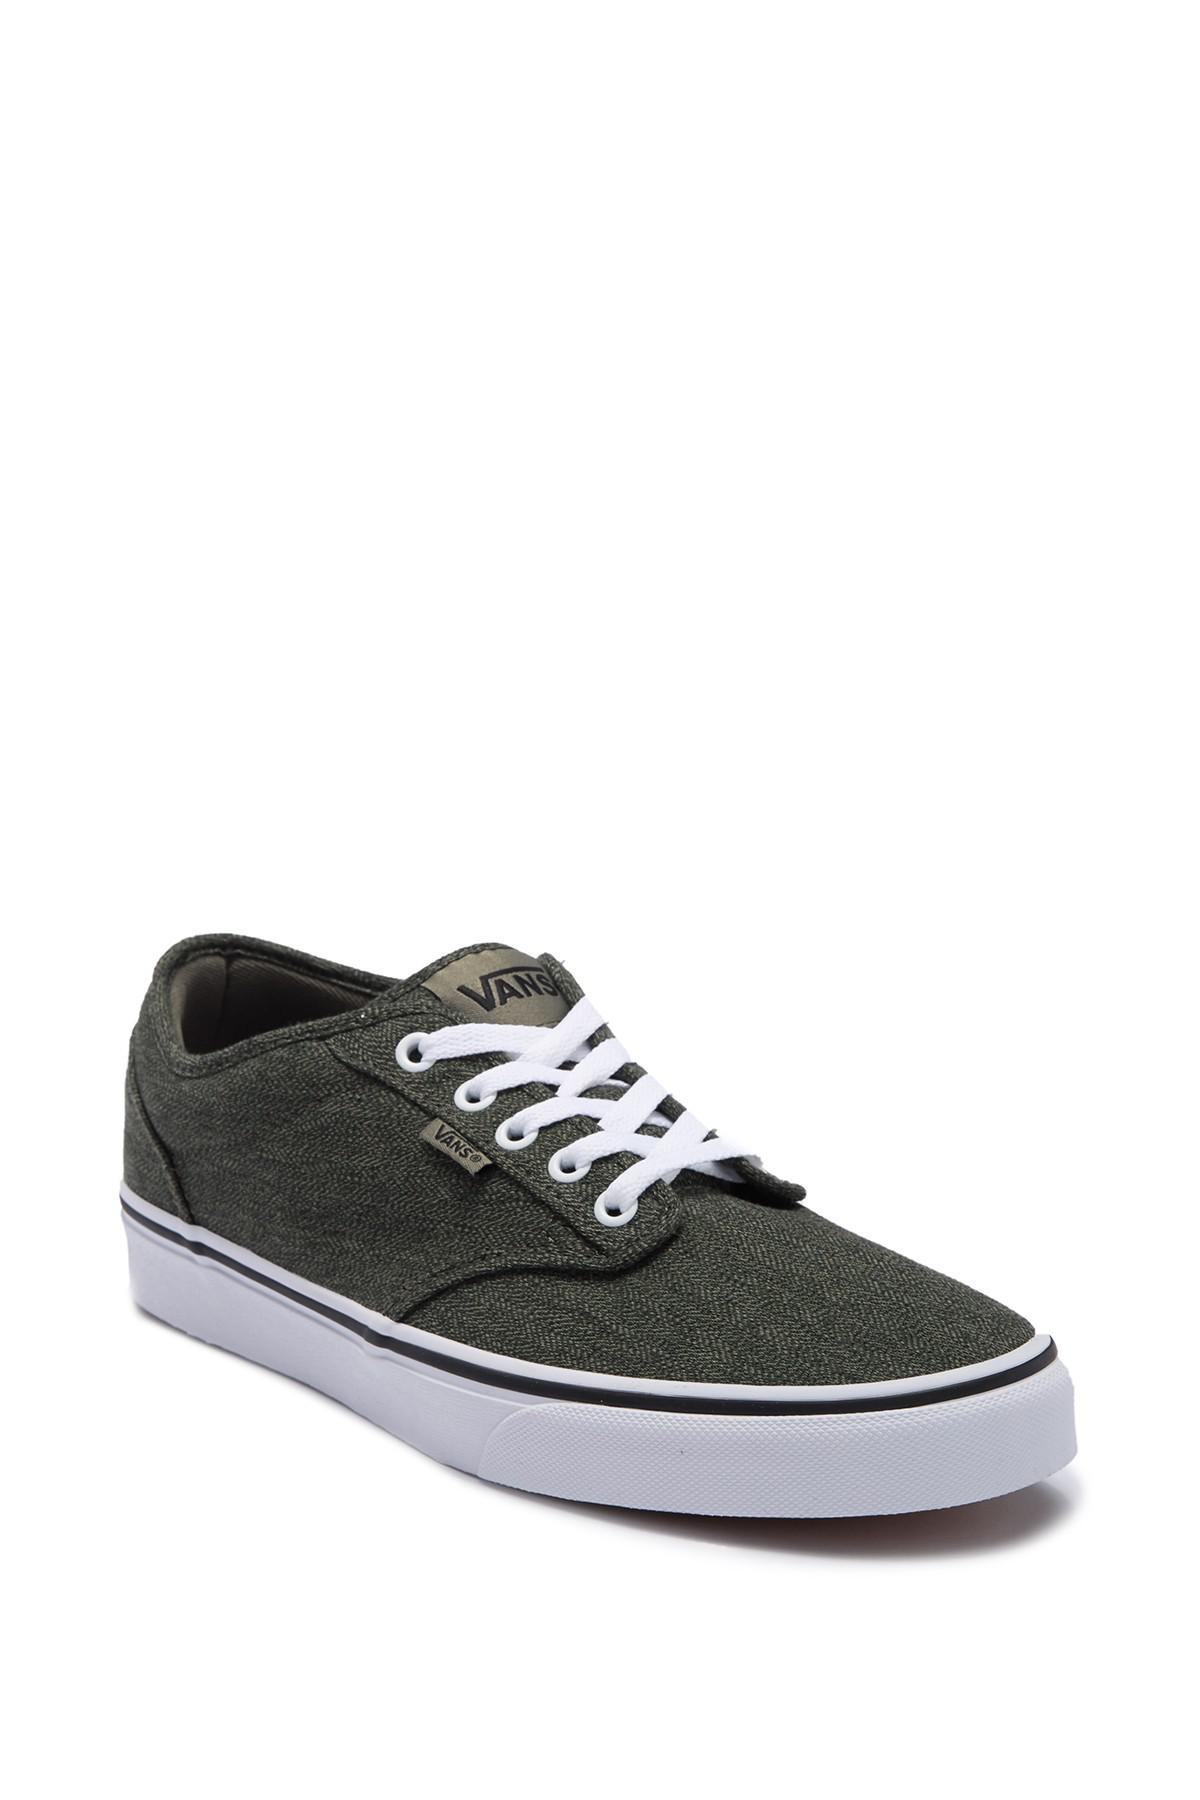 c2e0eaad1d Vans Atwood Static Herringbone Sneaker for Men - Lyst